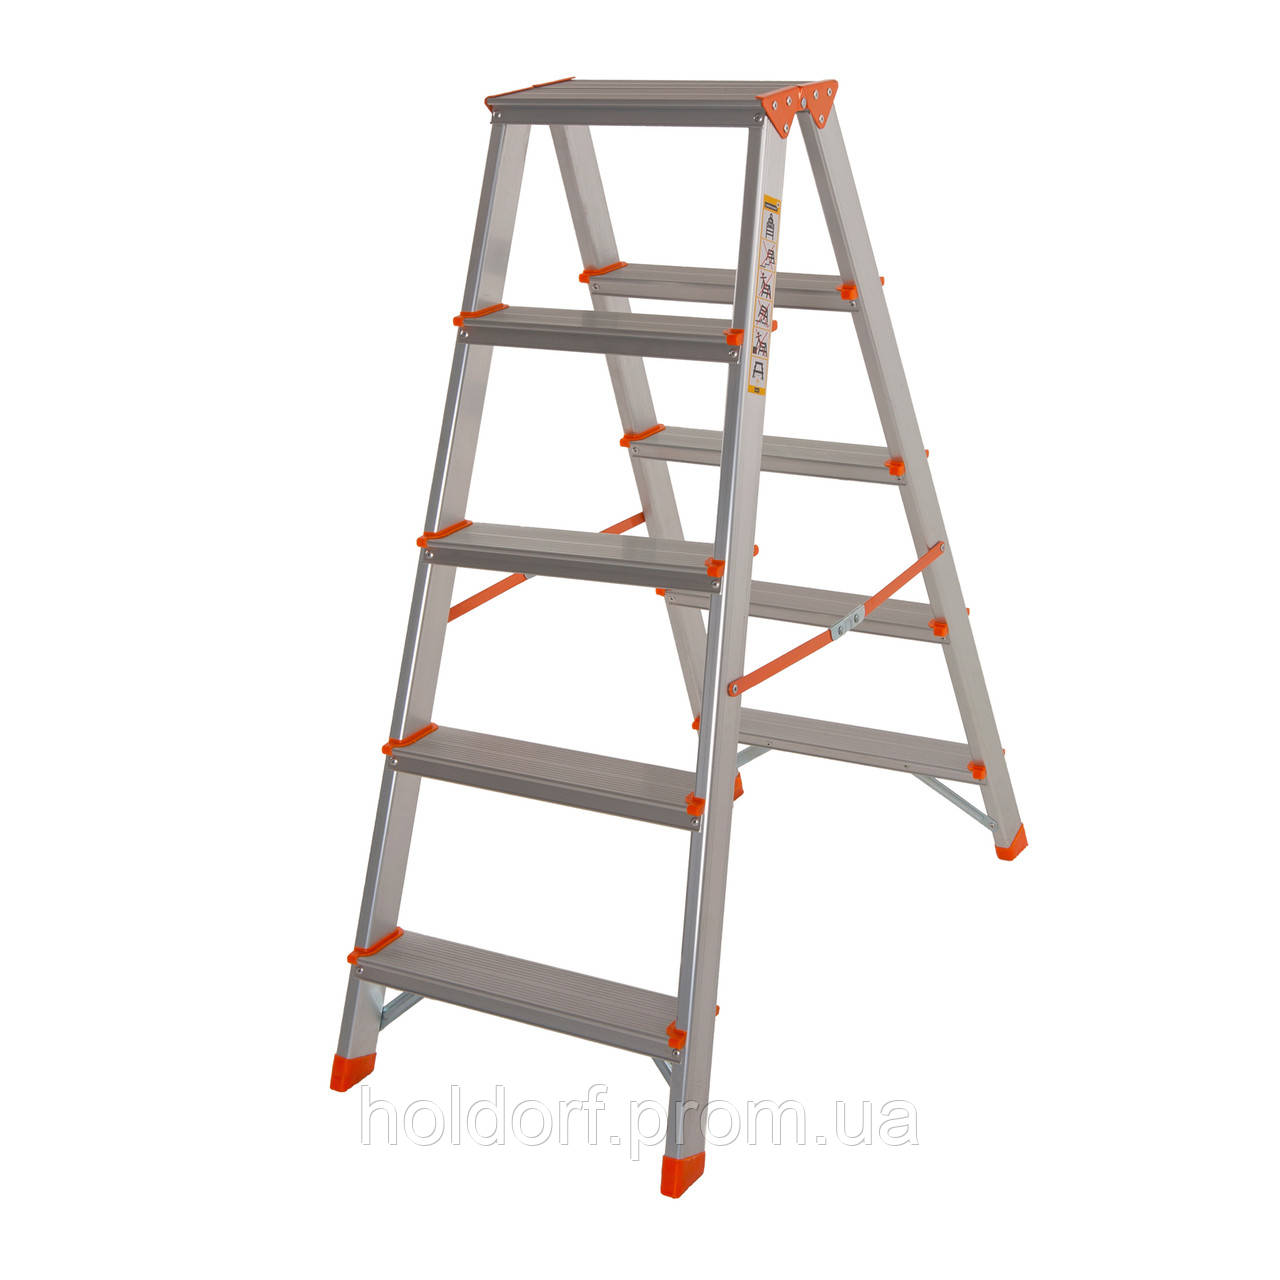 Стремянка двусторонняя алюминиевая Laddermaster Polaris A5A5. 2x5 ступенек